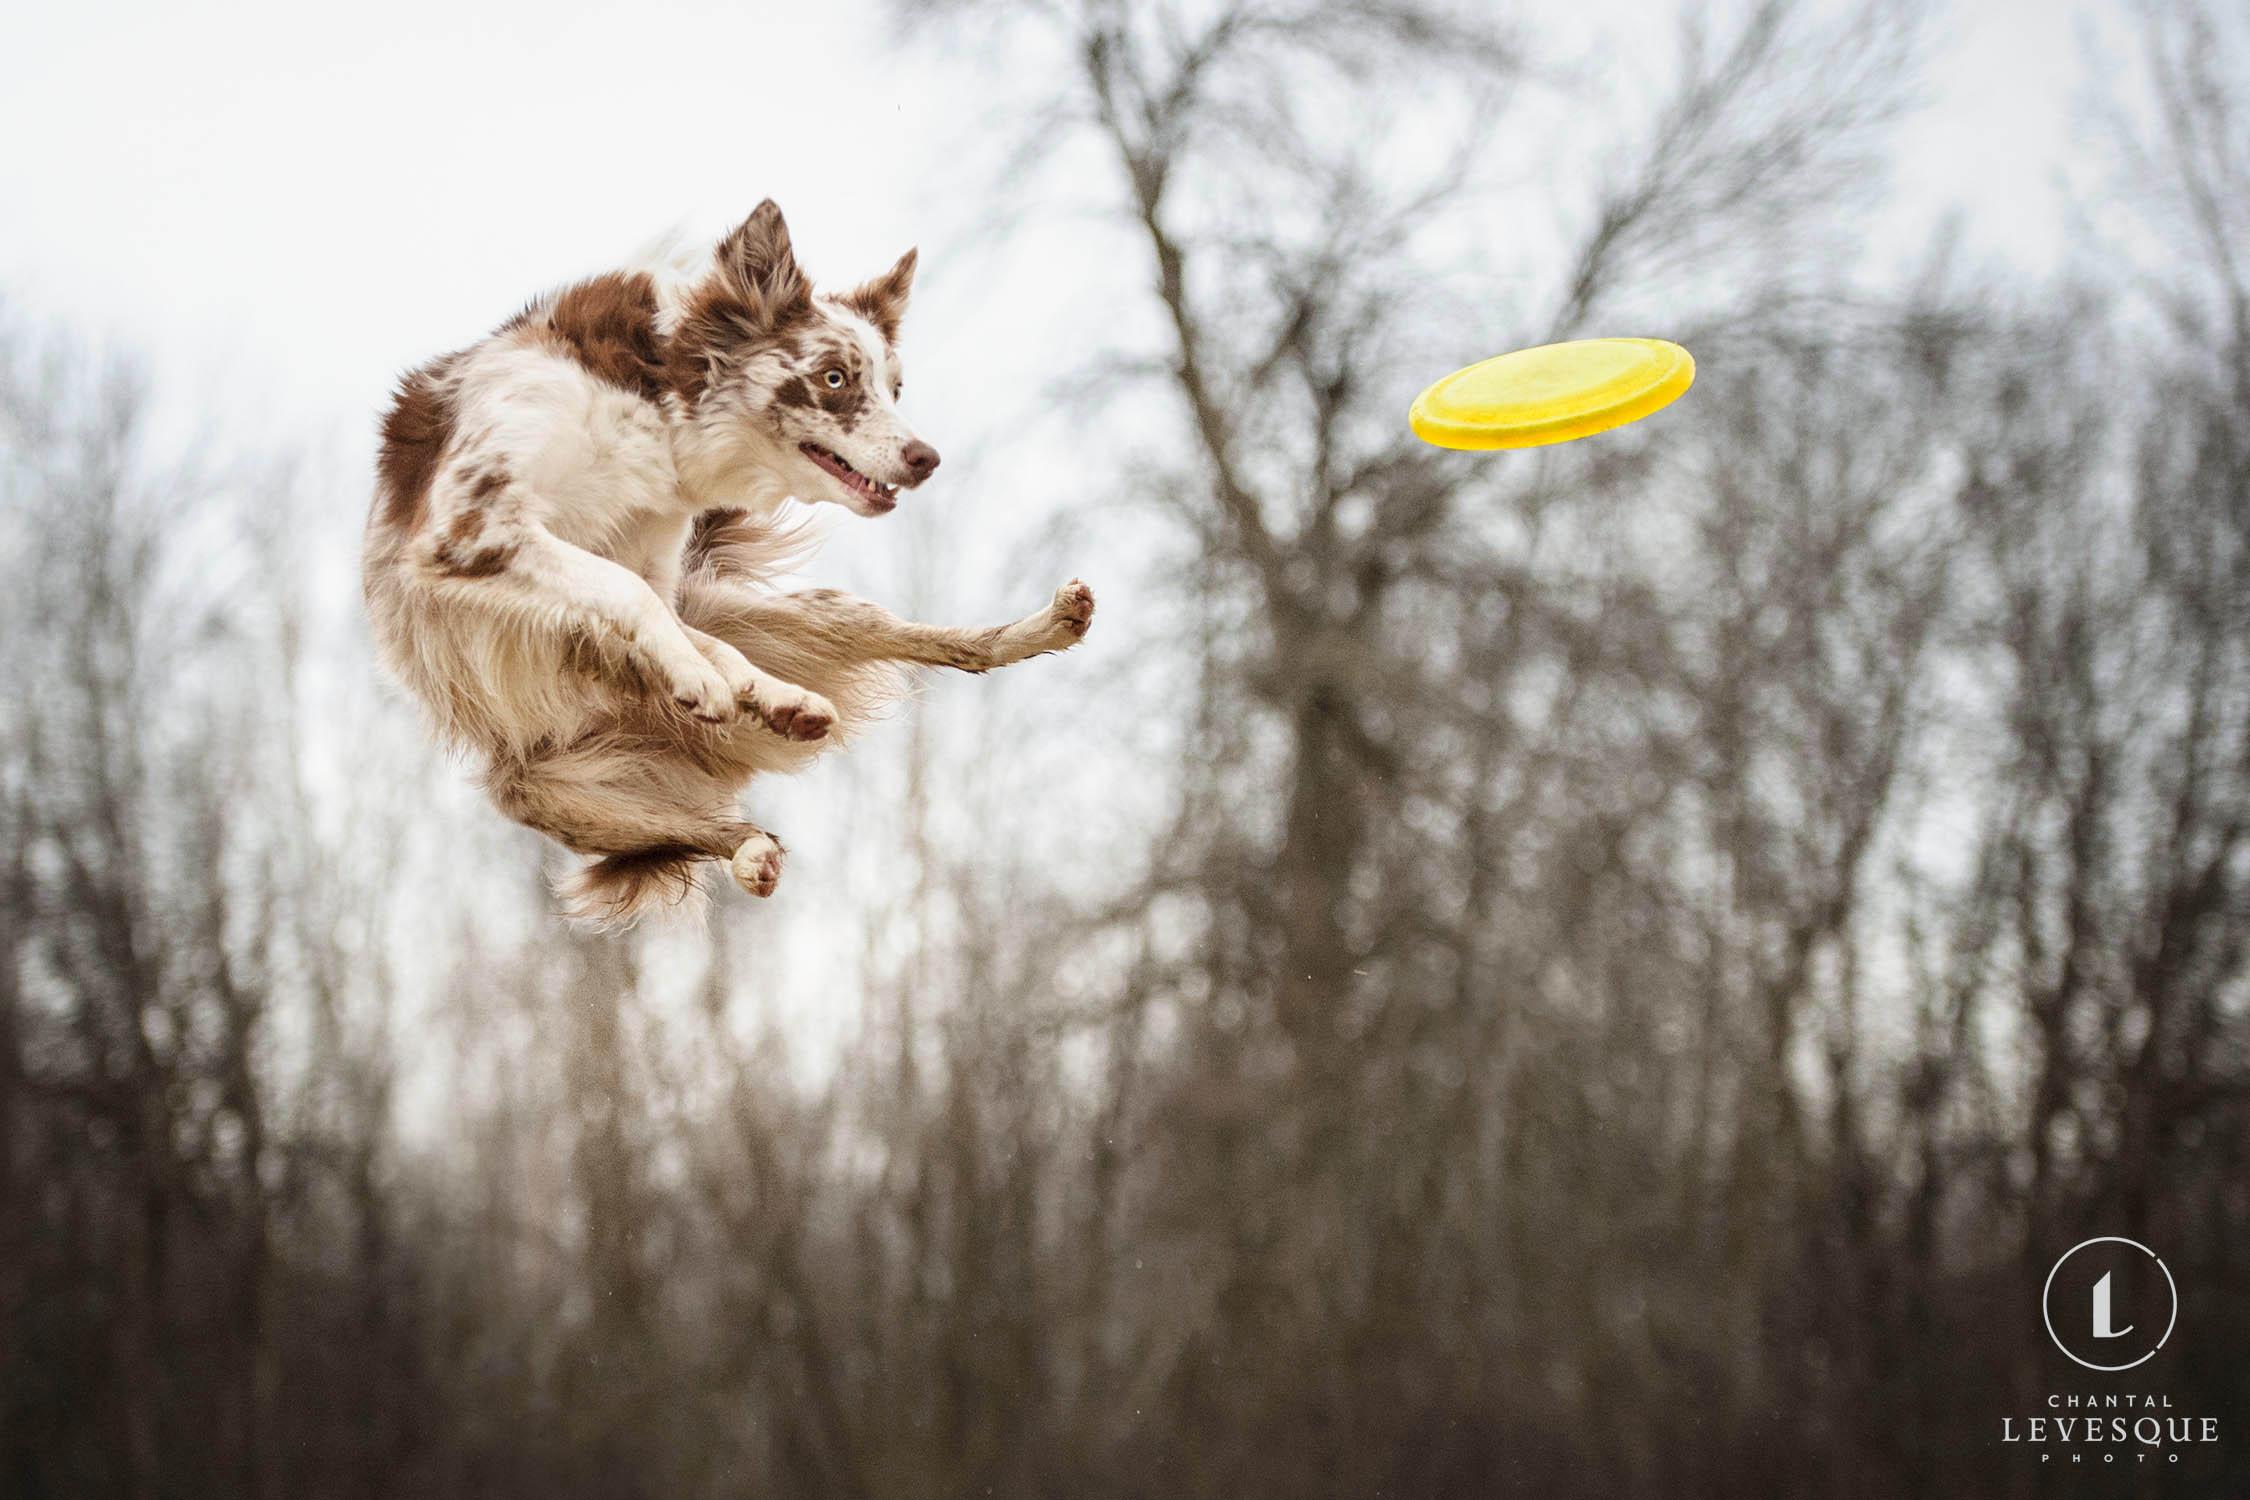 dog-jump-frisbee.jpg